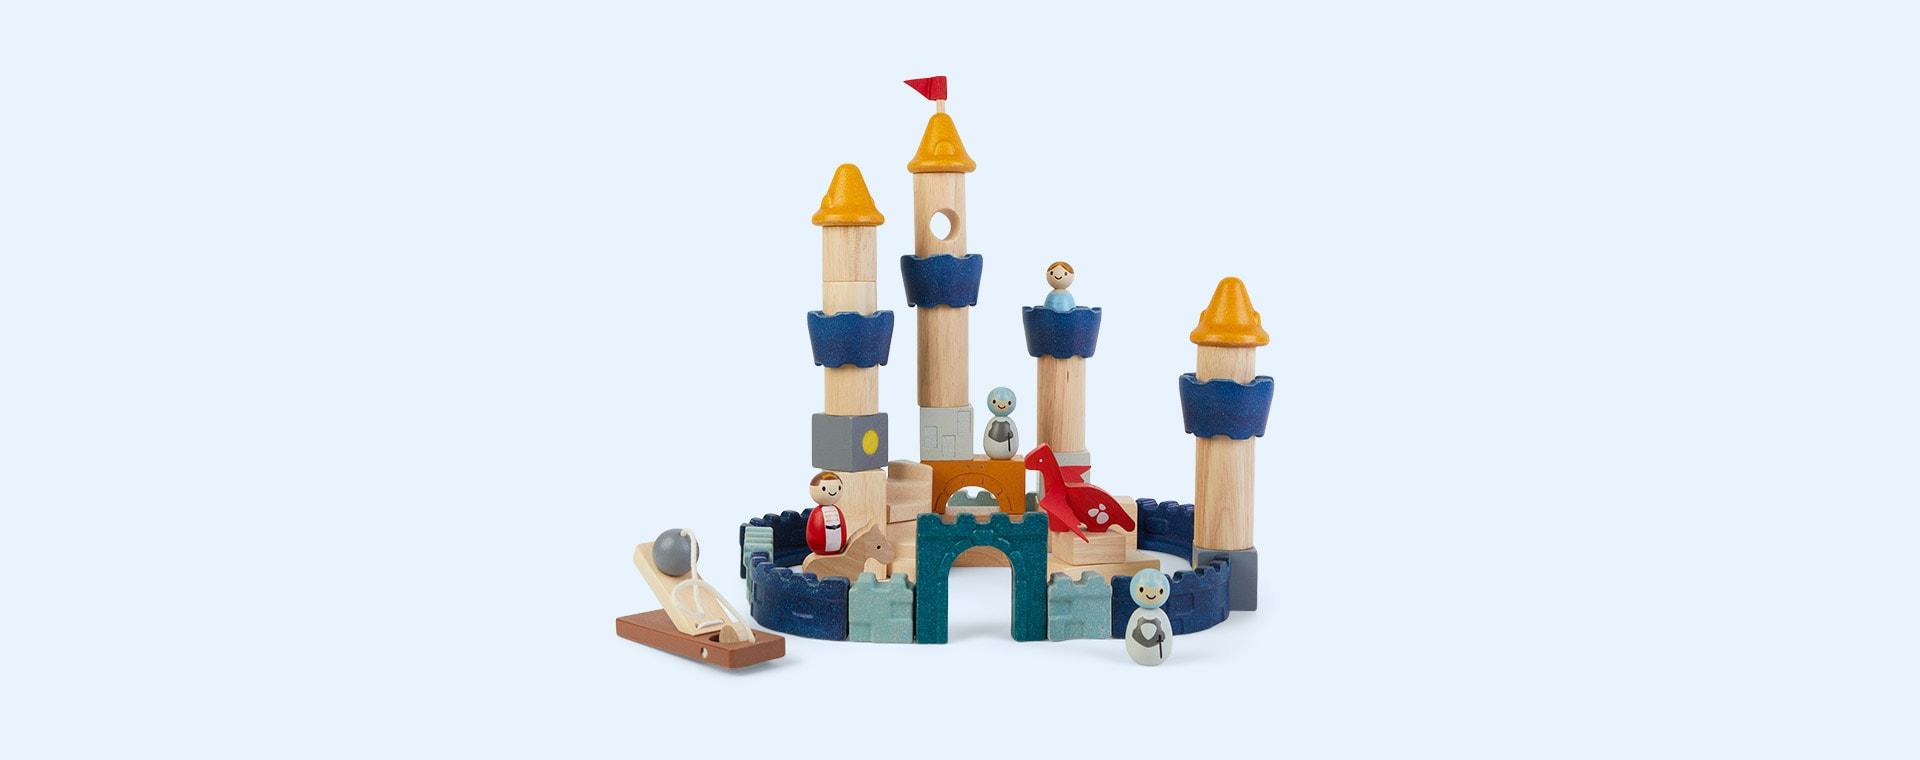 Orchard Plan Toys Castle Blocks